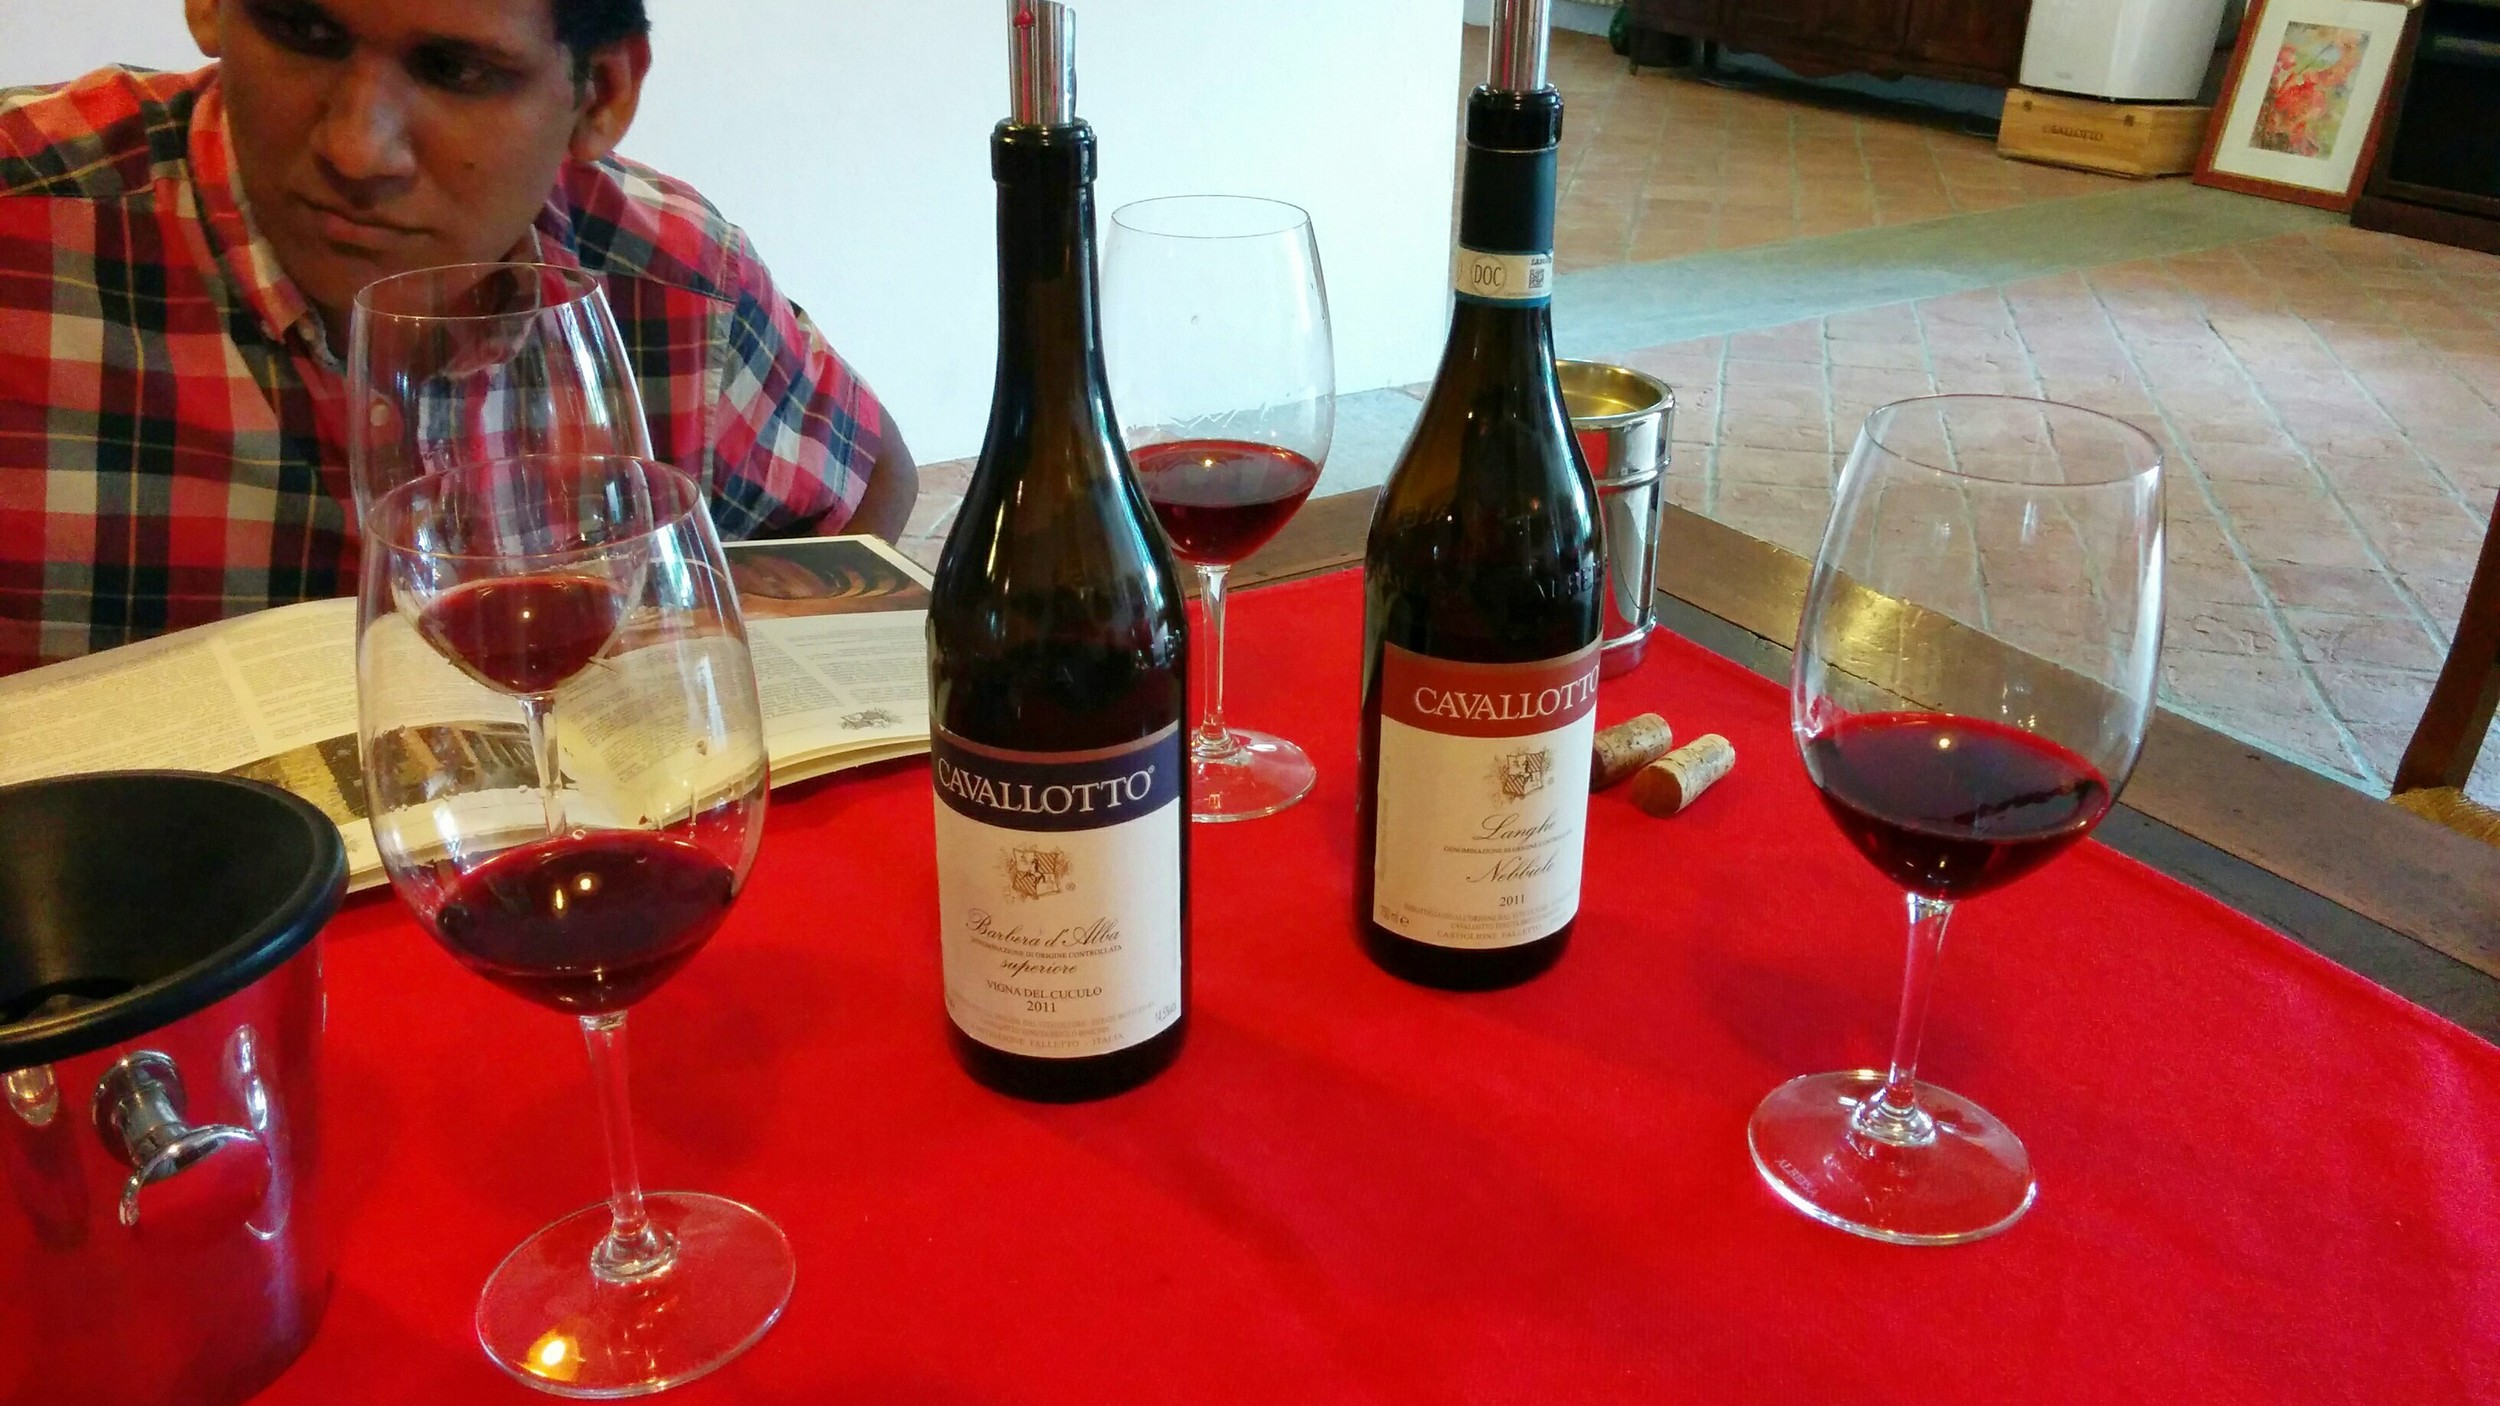 Castiglione Falletto (CN): Toney enjoying his morning wine tasting at   Cavallotto